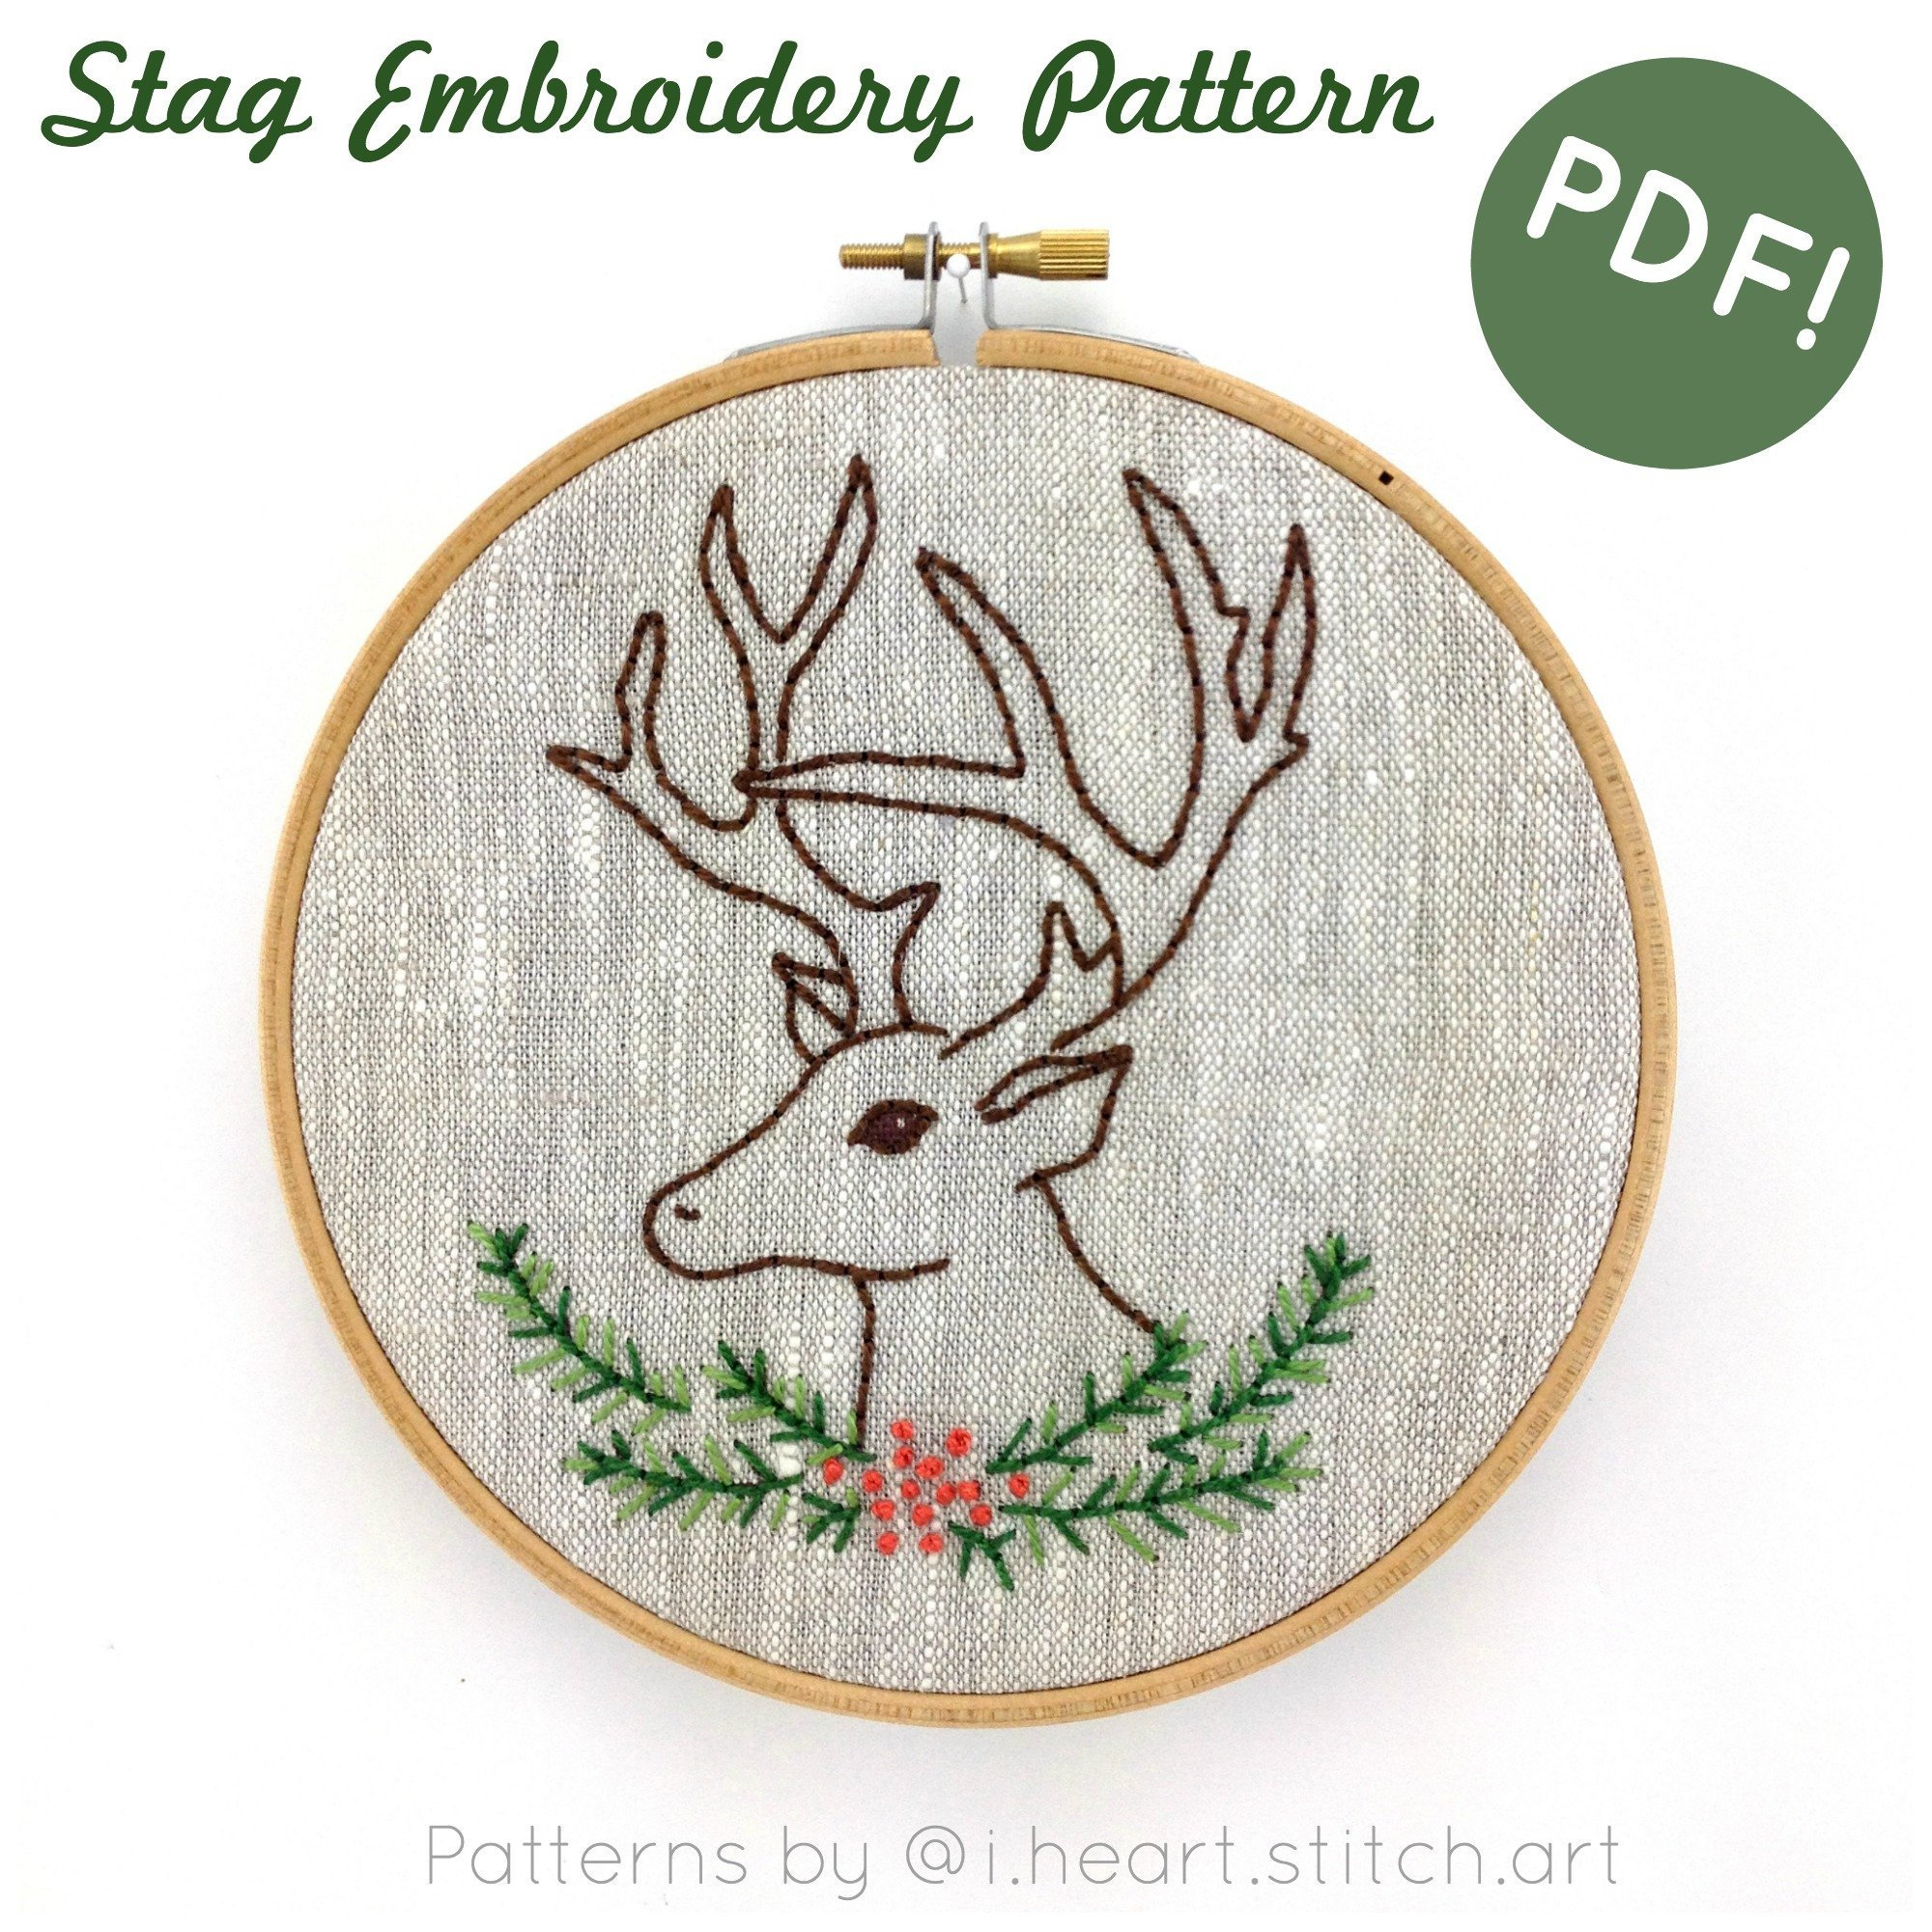 Embroidery Christmas Patterns Christmas Hand Embroidery Pattern Stag Embroidery Pattern Deer Embroidery Pattern Pdf Cross Stitch Pattern Embroidery Pattern Pdf